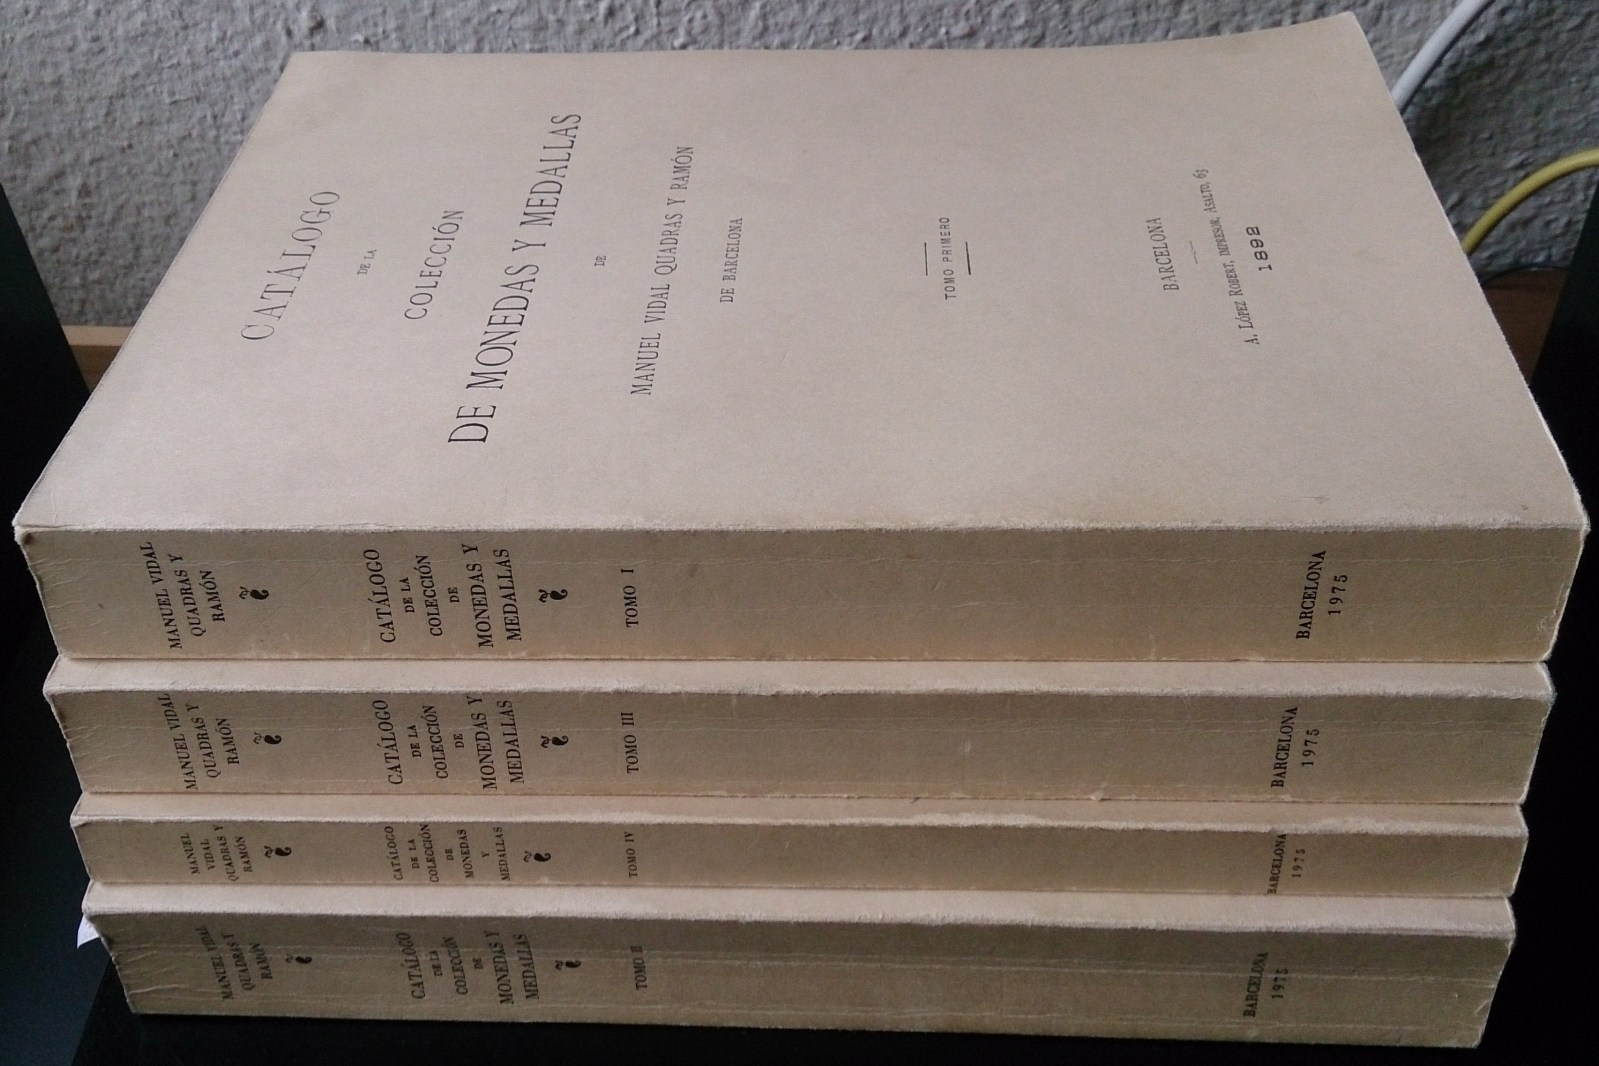 Libros sobre numismática Oadkar